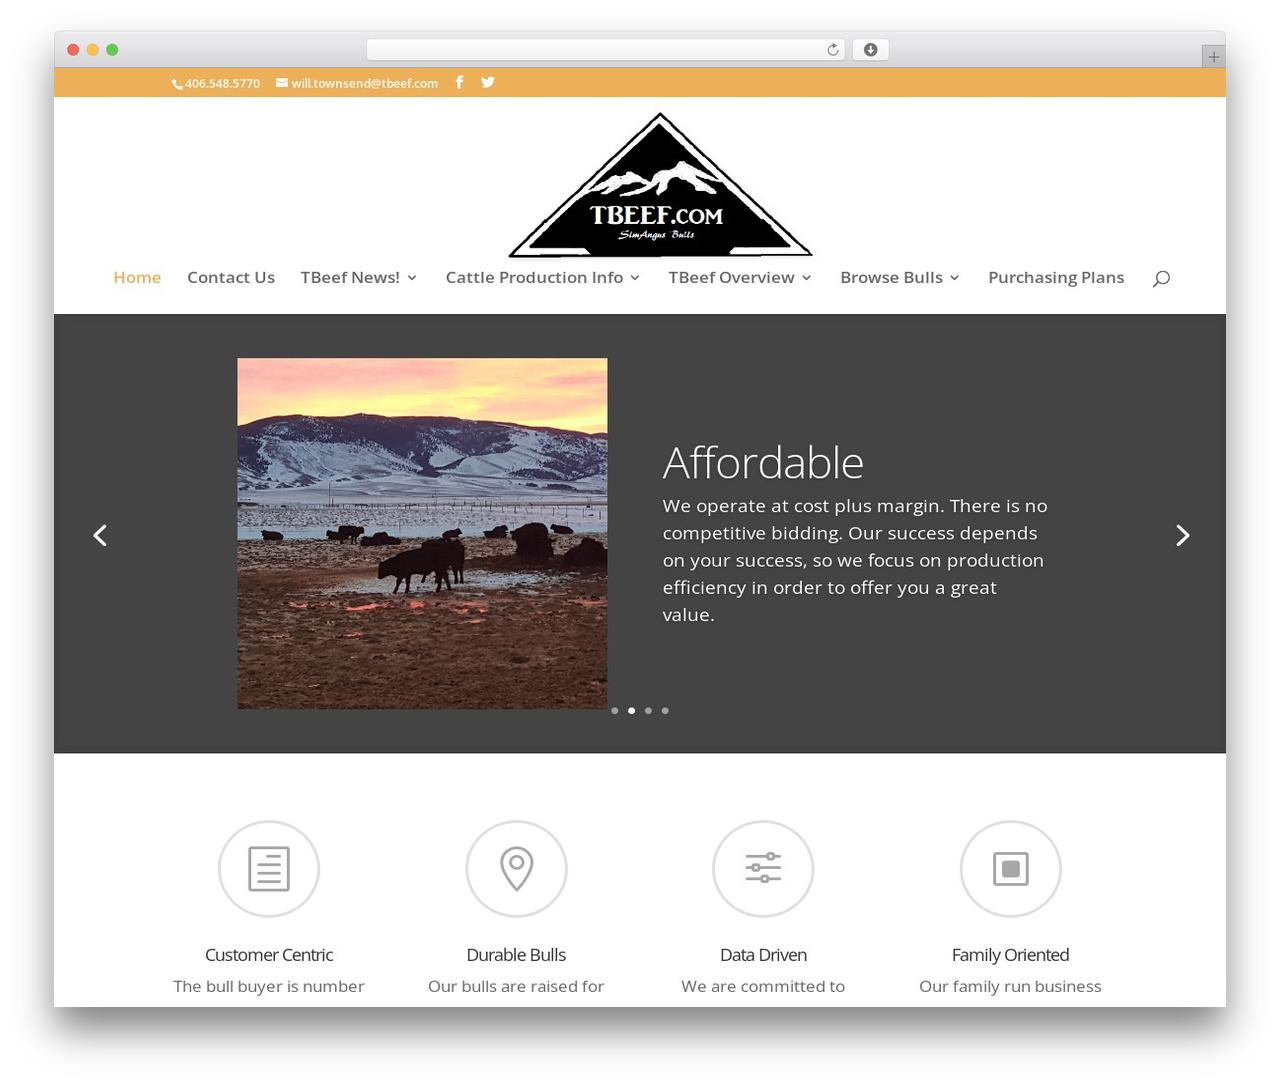 Divi WordPress theme by Elegant Themes - tbeef.com